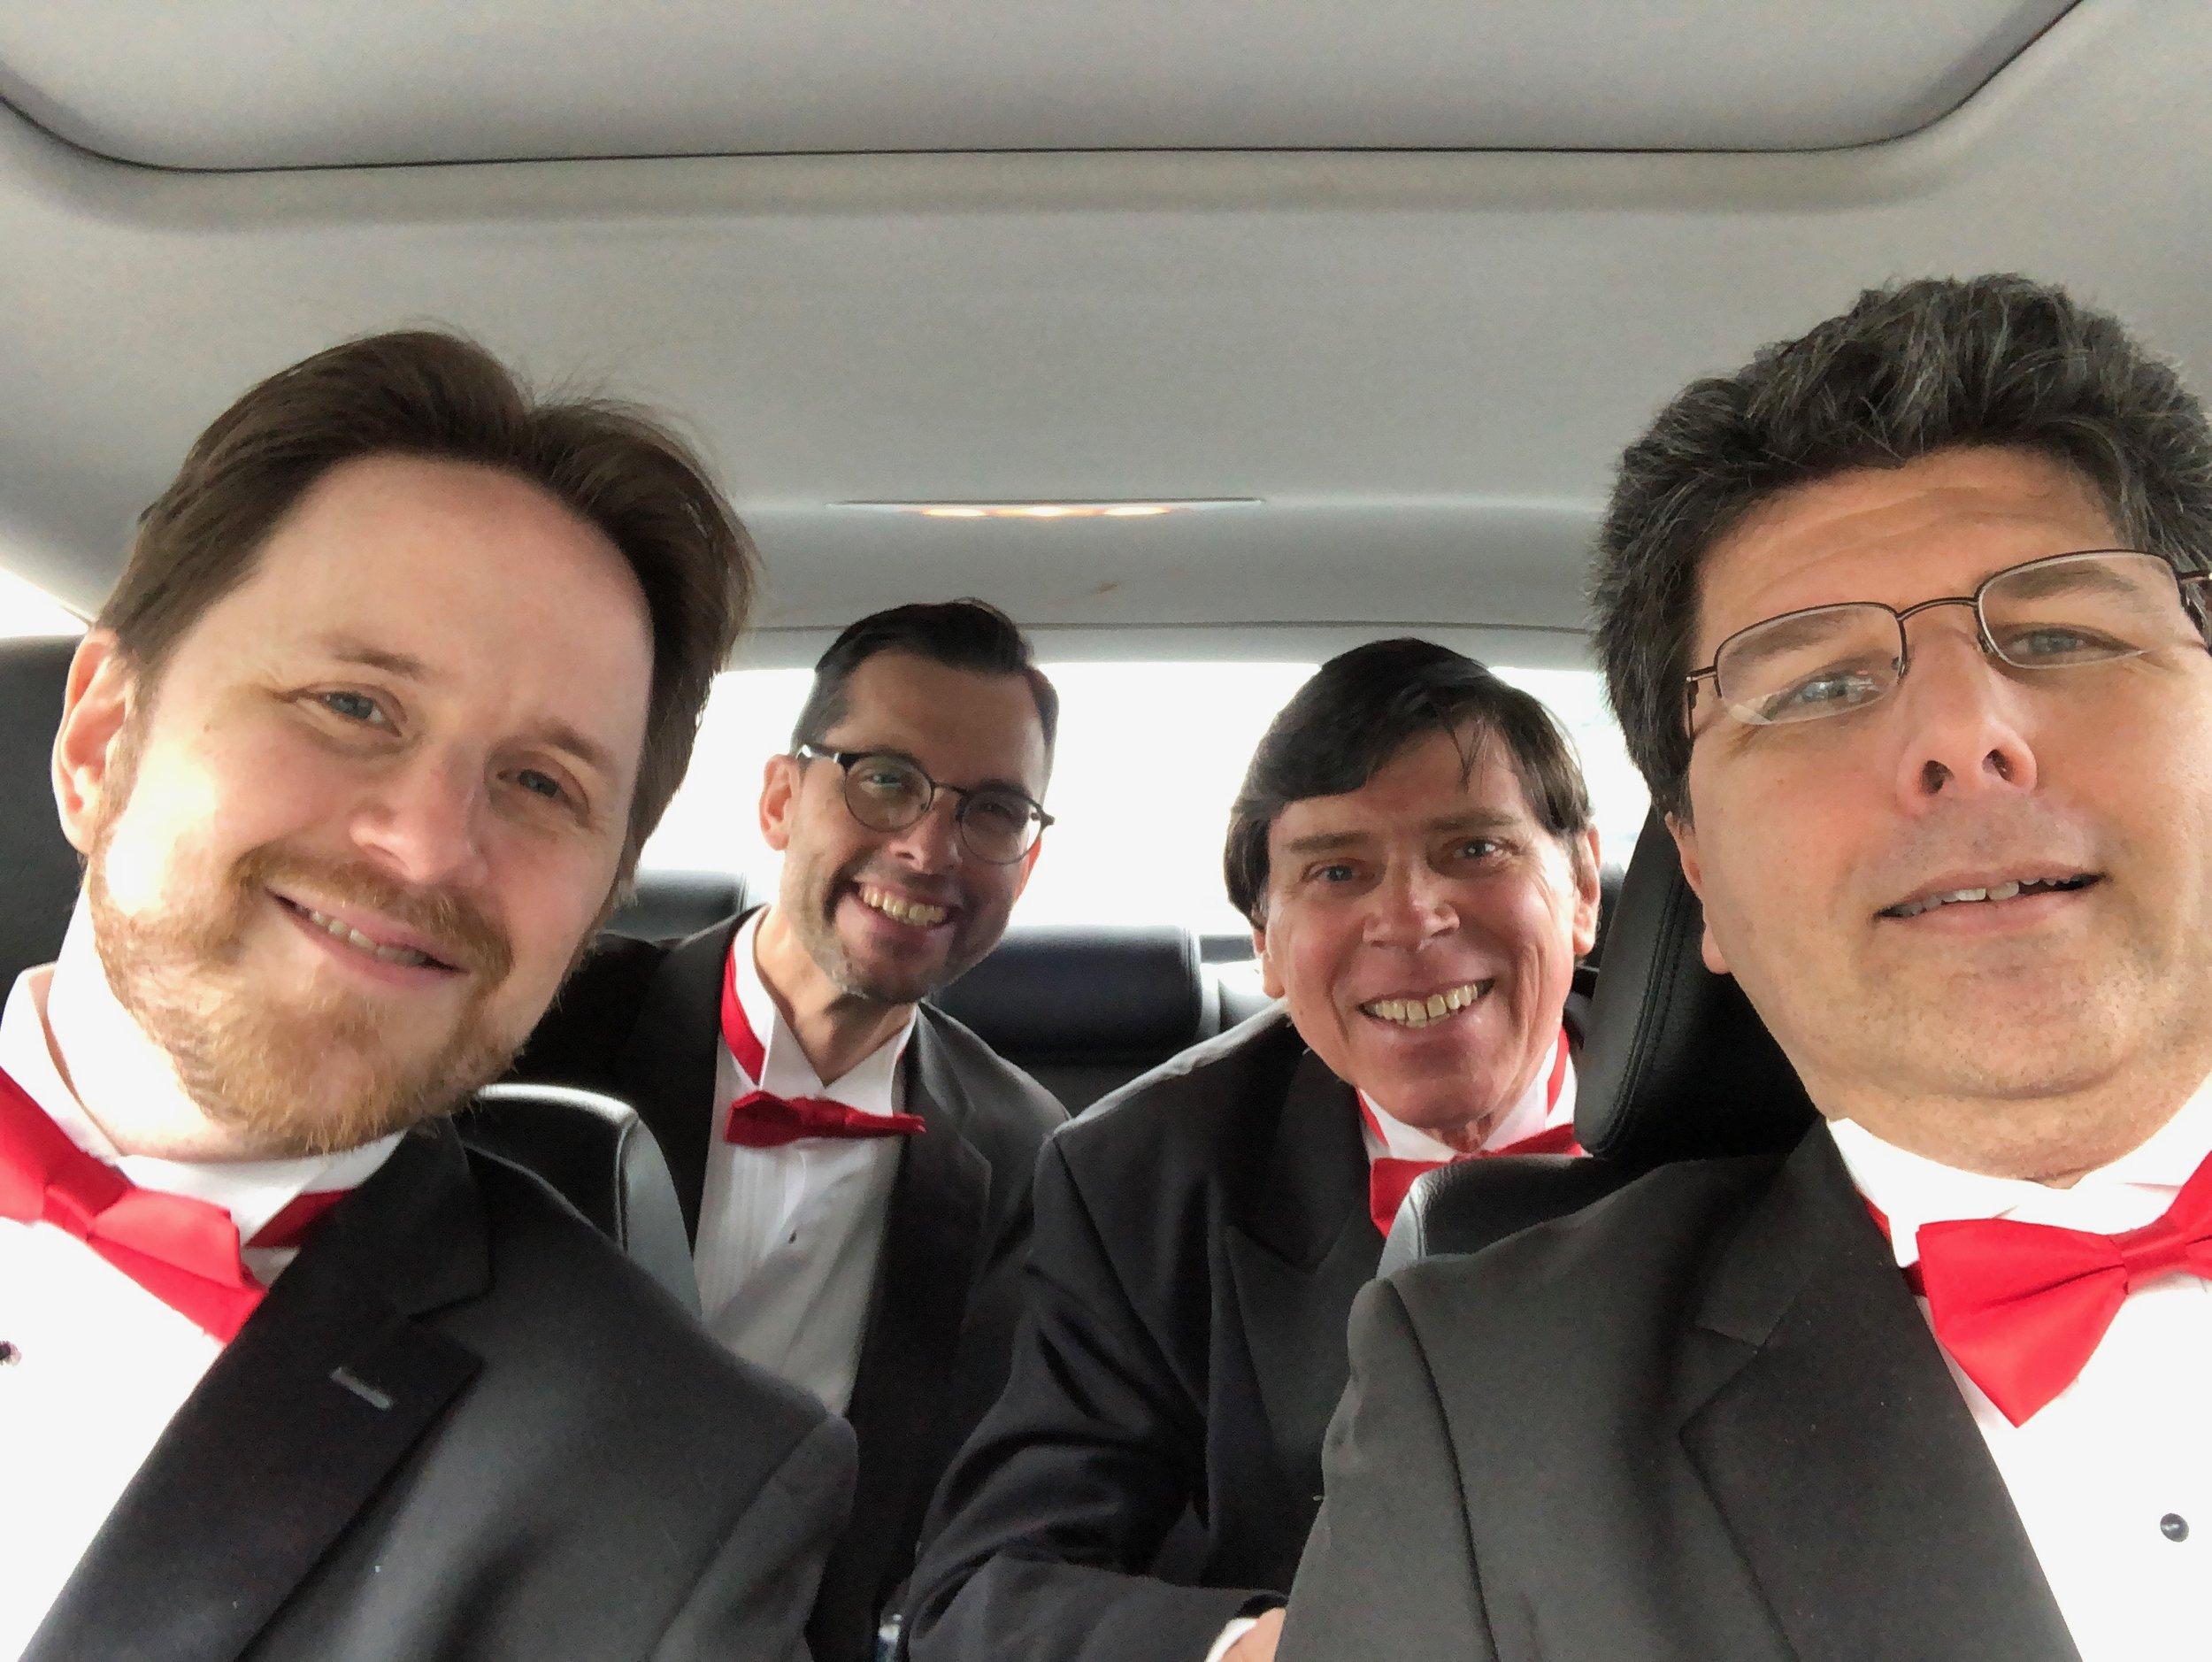 The Delegates  - Nico Scopelliti, Dan Ray, Dude Siebert and Craig Scott during their travels.